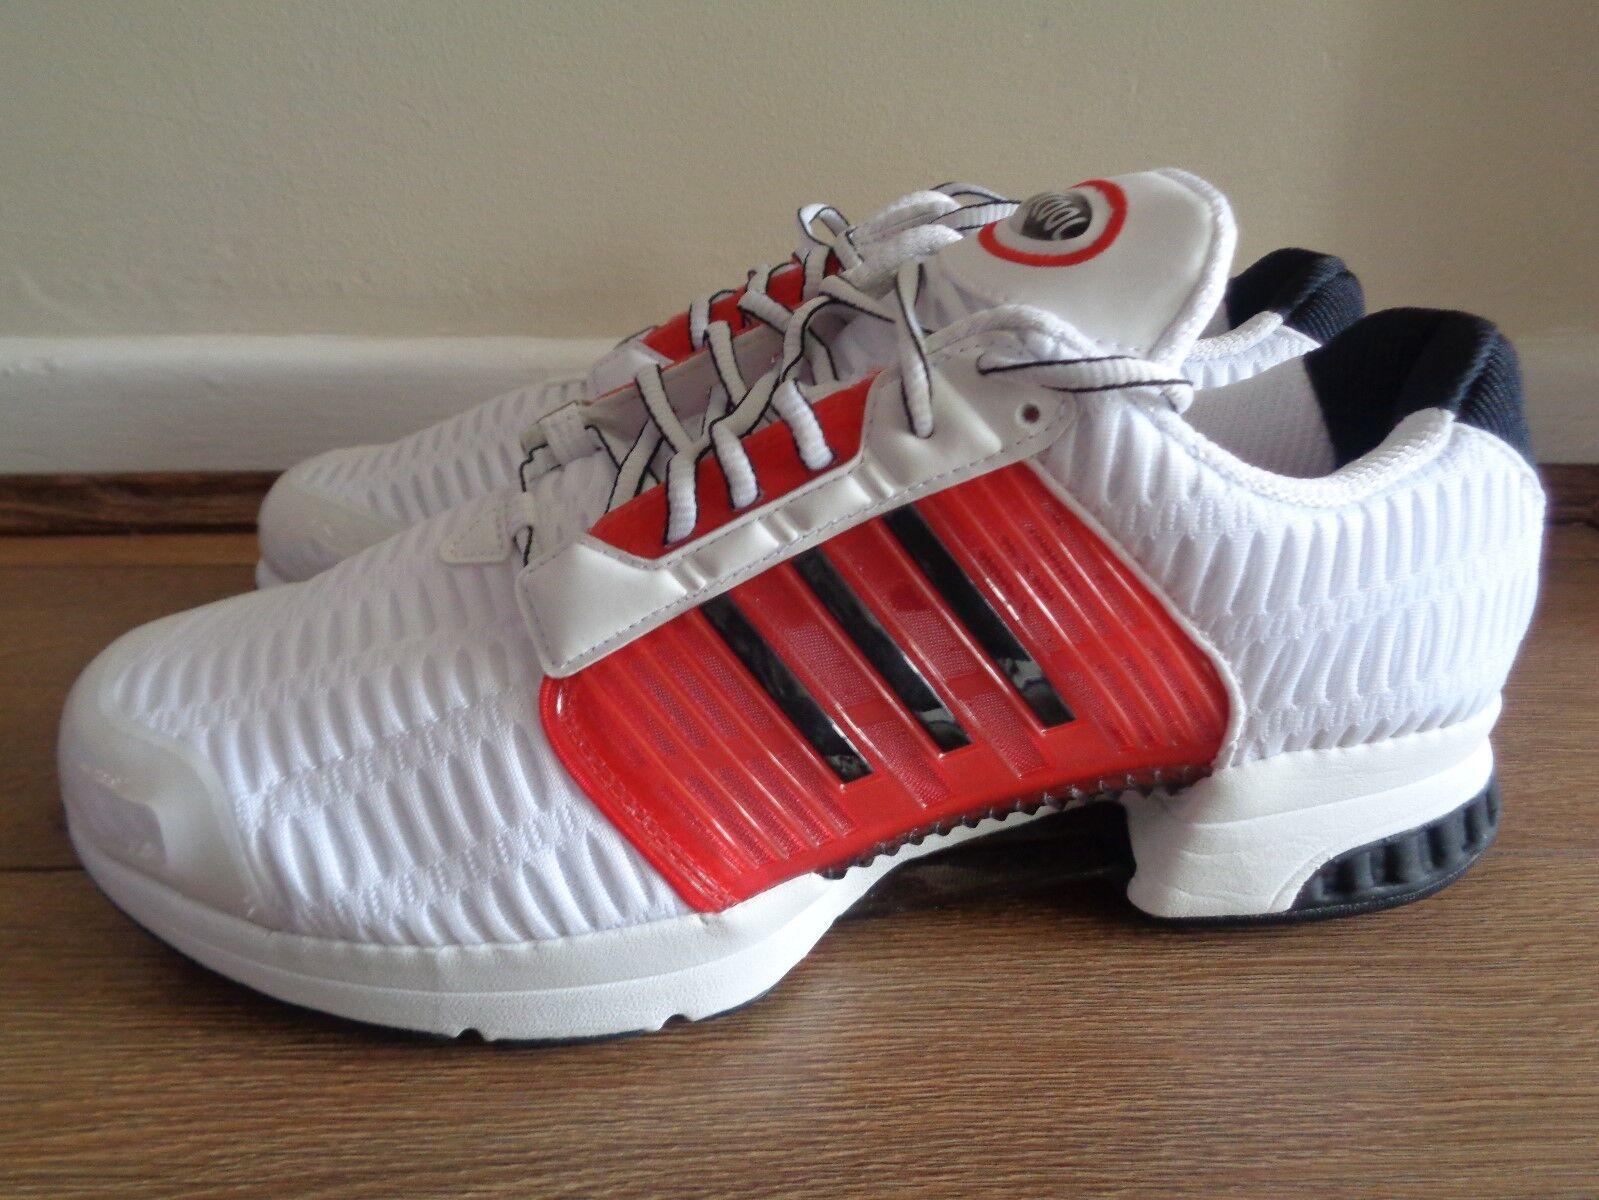 Adidas - Turnschuhe - trainer cool 1 männer 8,5 bb0667 42 us - 8,5 männer neue + box d40deb